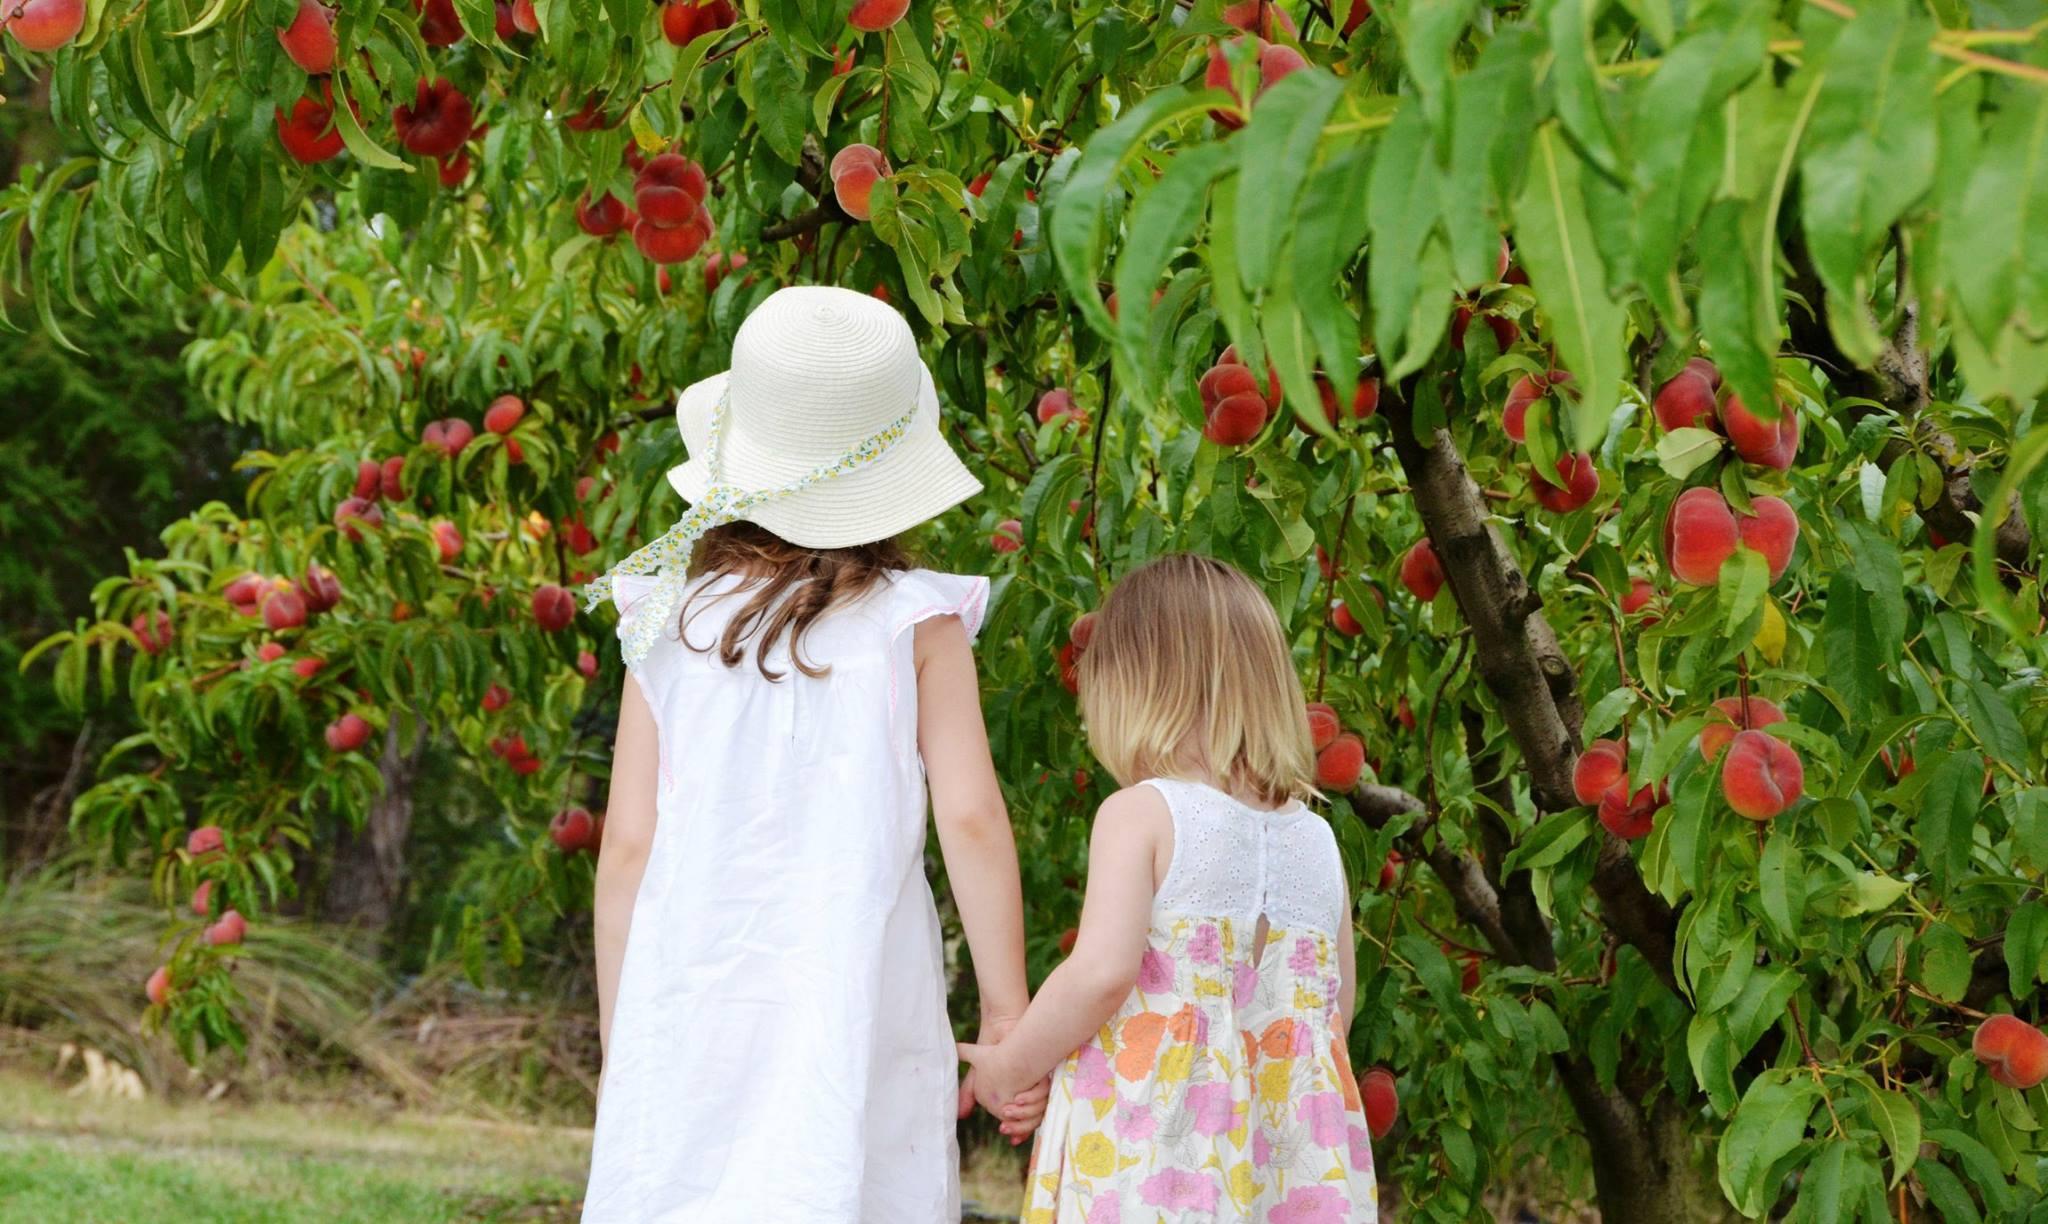 Raynard's Orchard